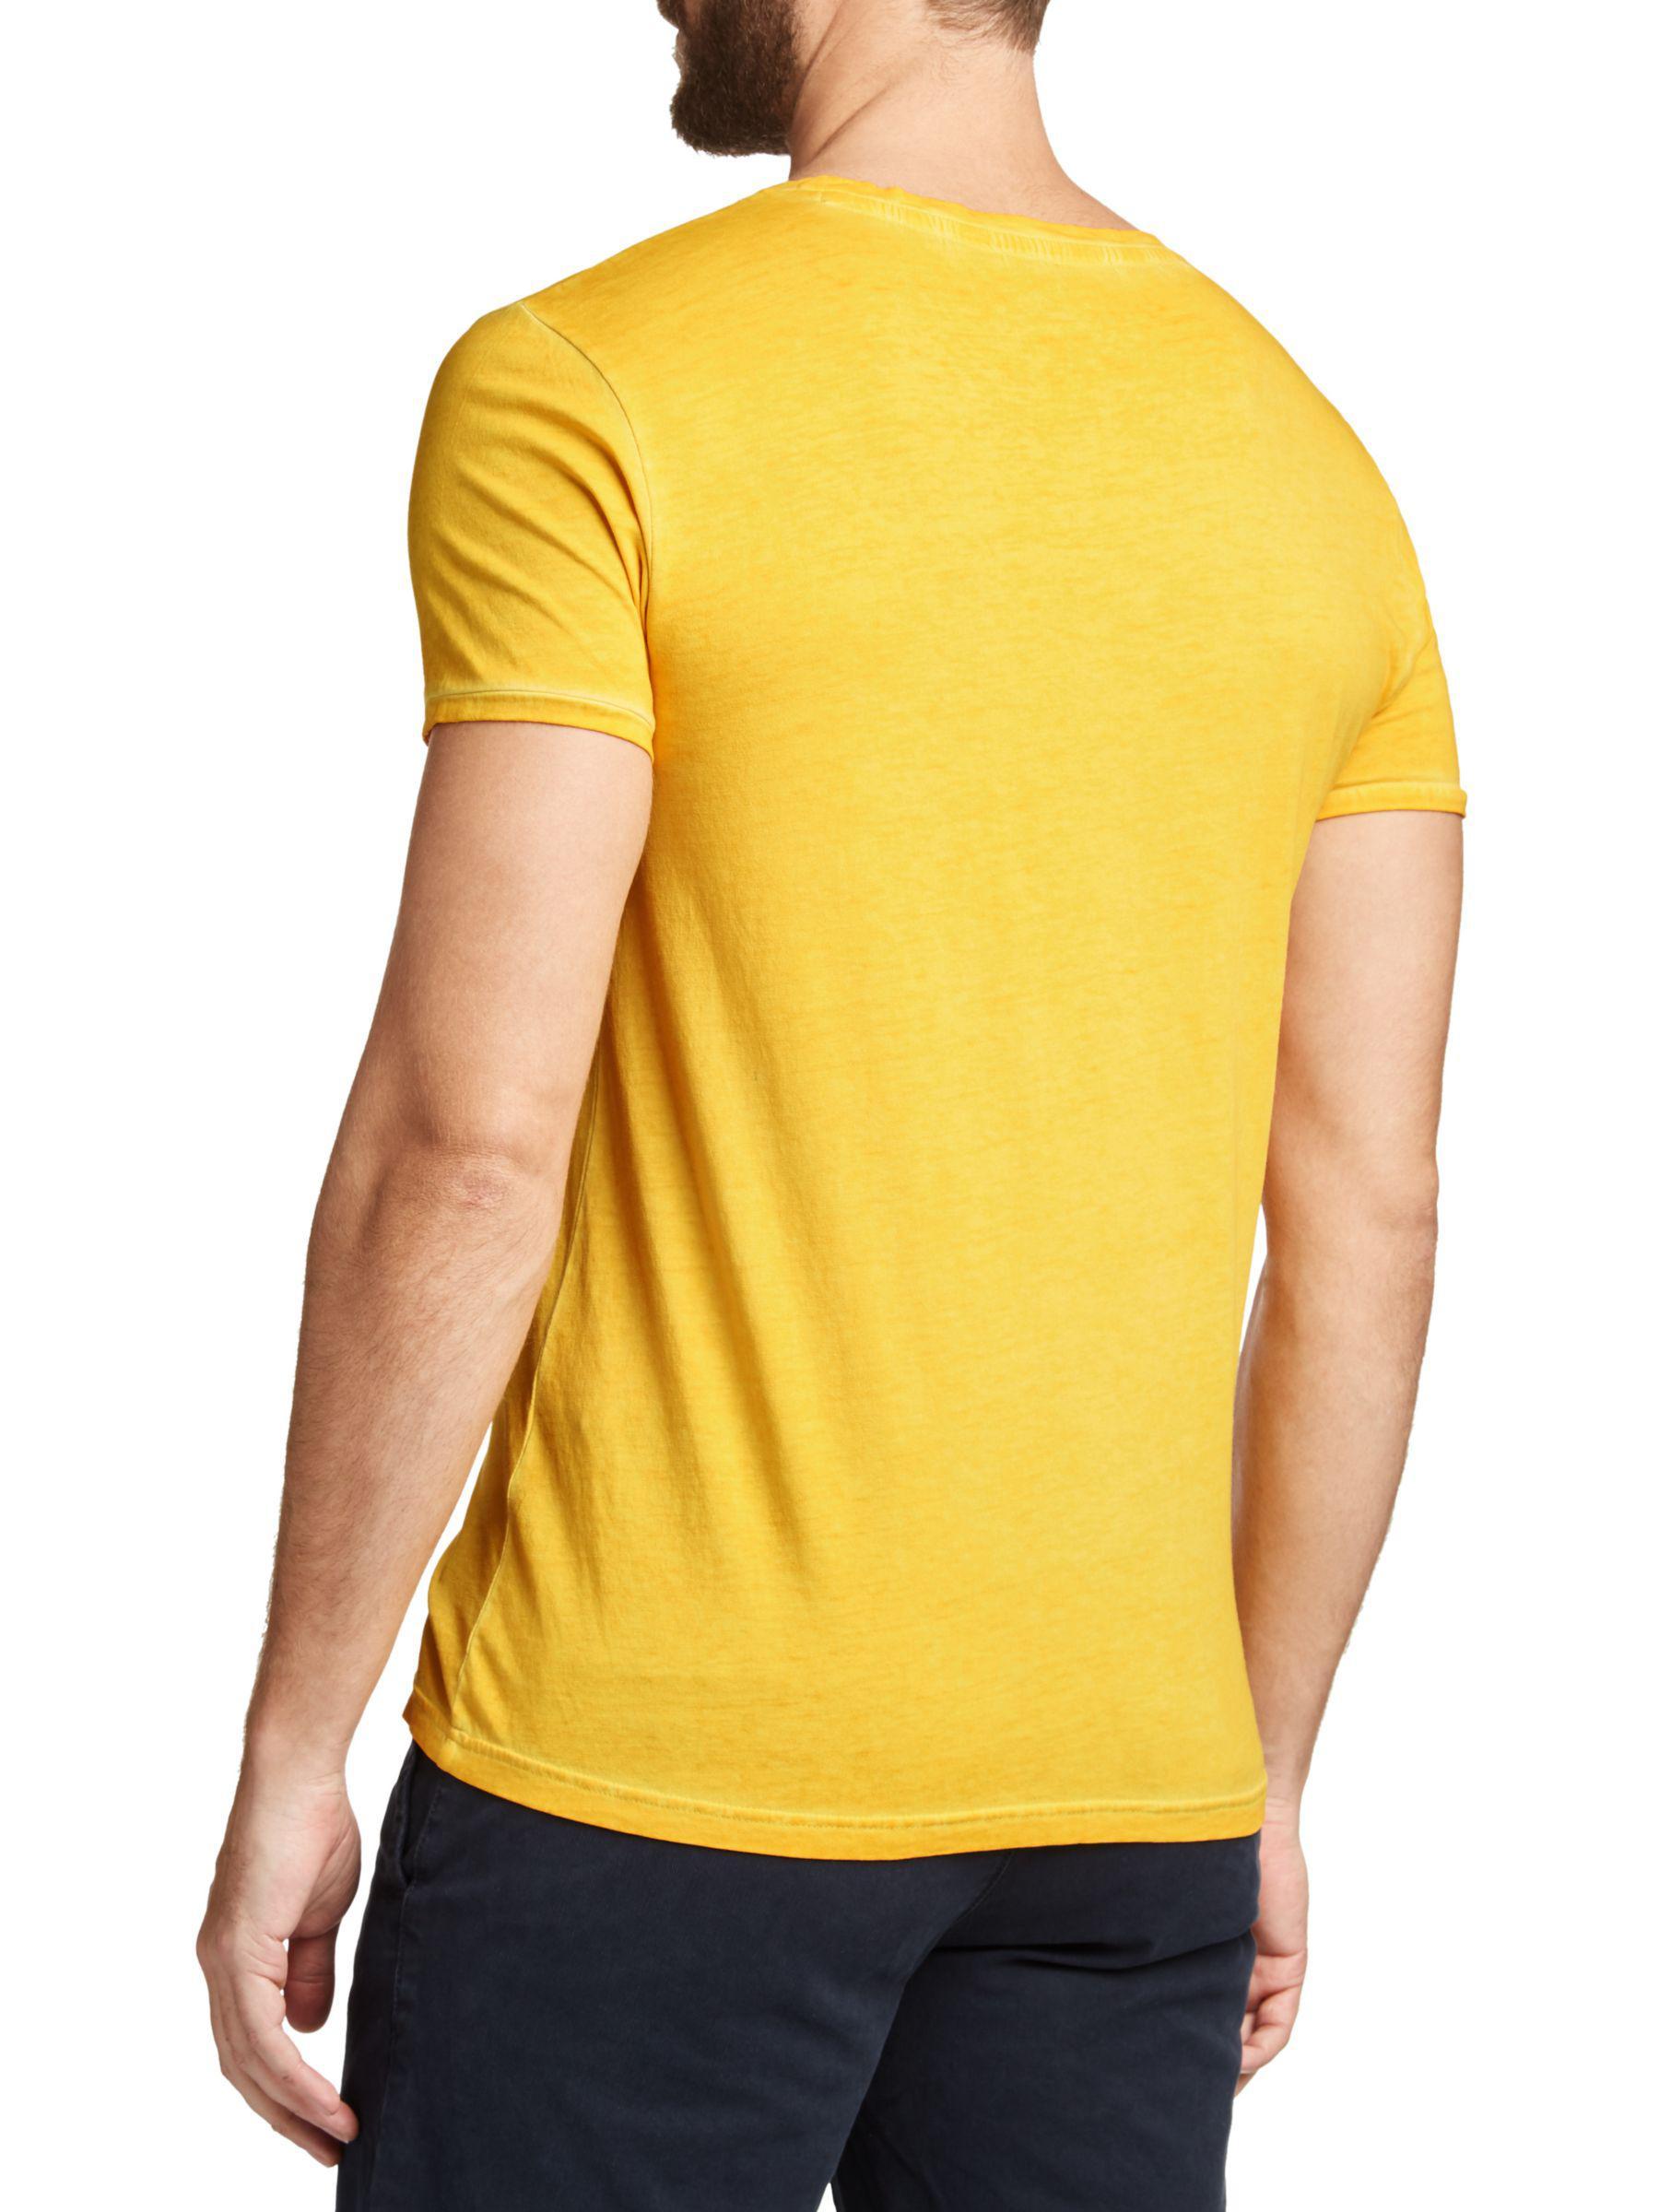 fcb841d1db BOSS Boss Troy Crew Neck T-shirt in Yellow for Men - Lyst